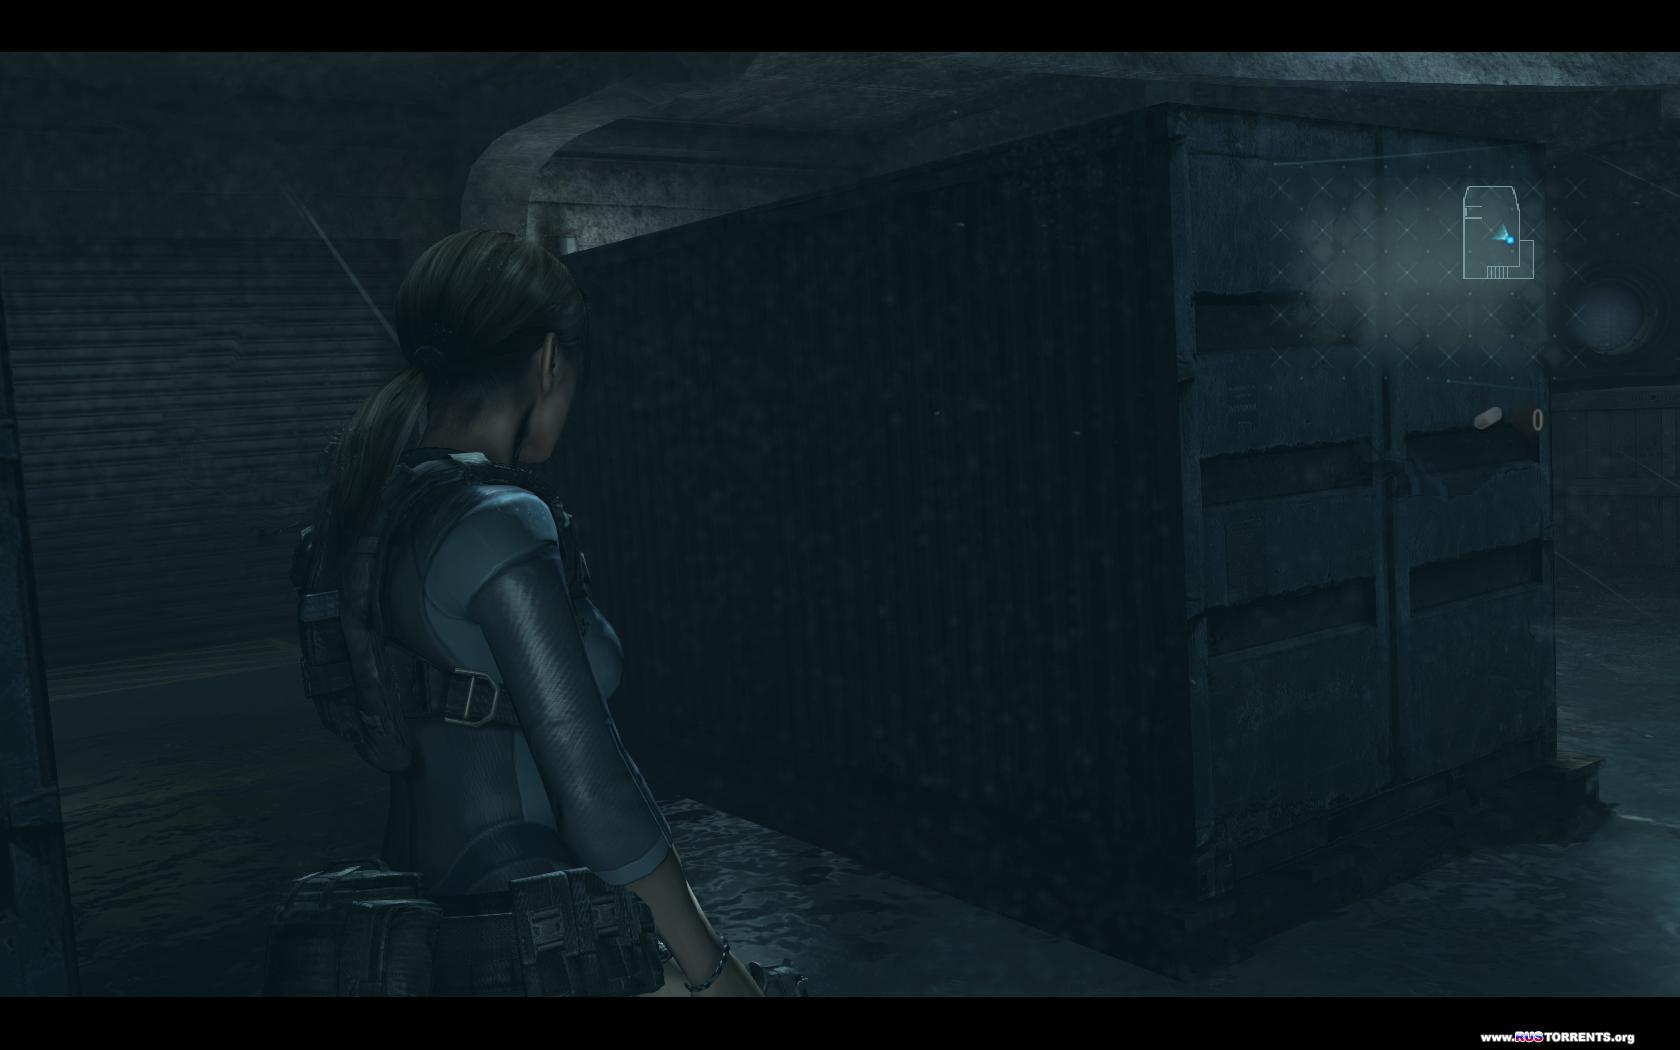 Resident Evil Revelations (Capcom) (RUS|ENG) [RePack] by Rick Deckard